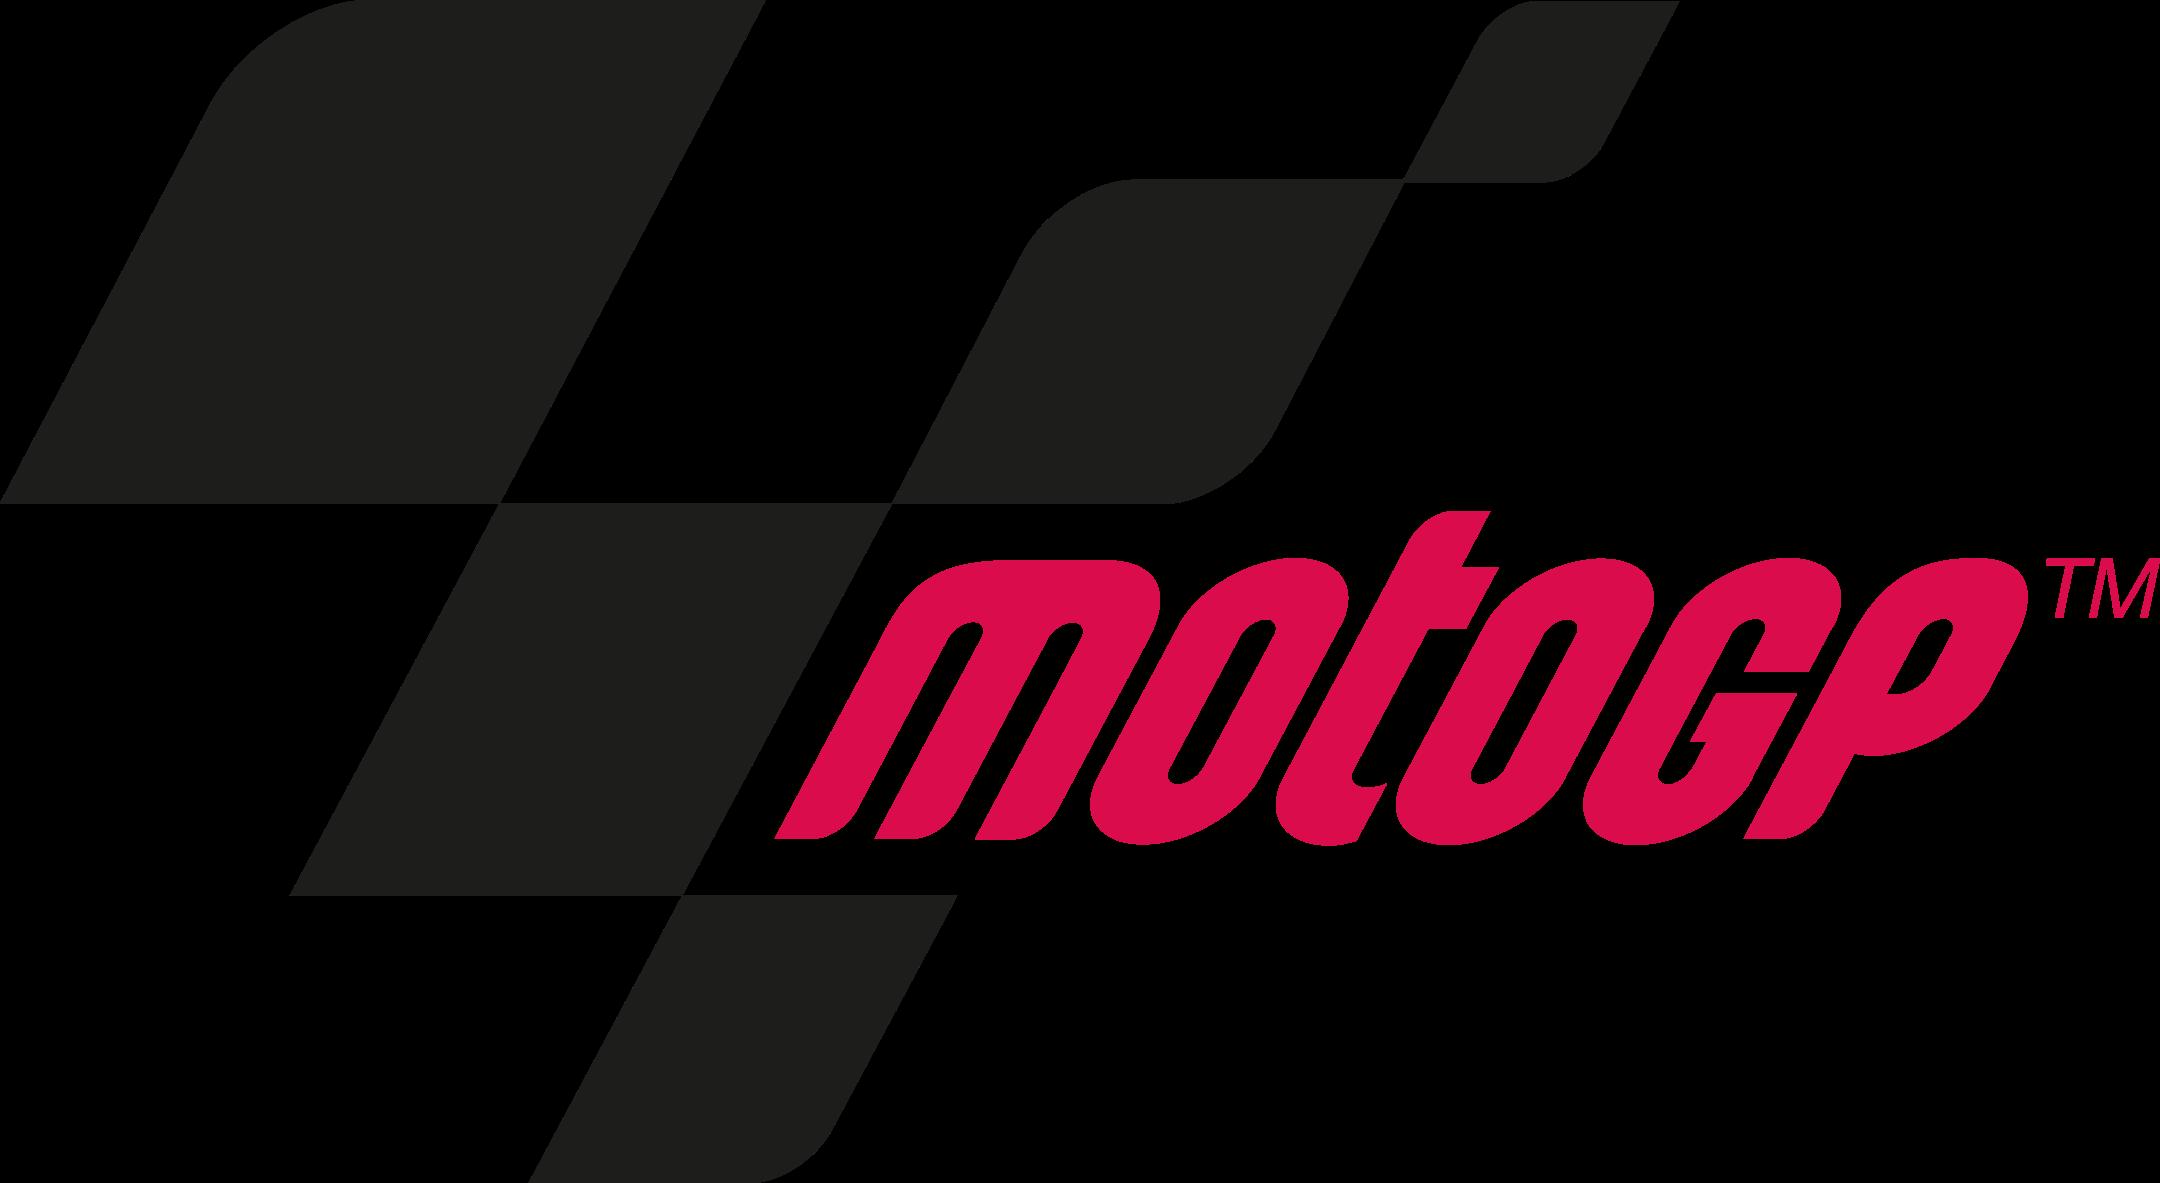 moto gp logo 1 - Moto GP Logo